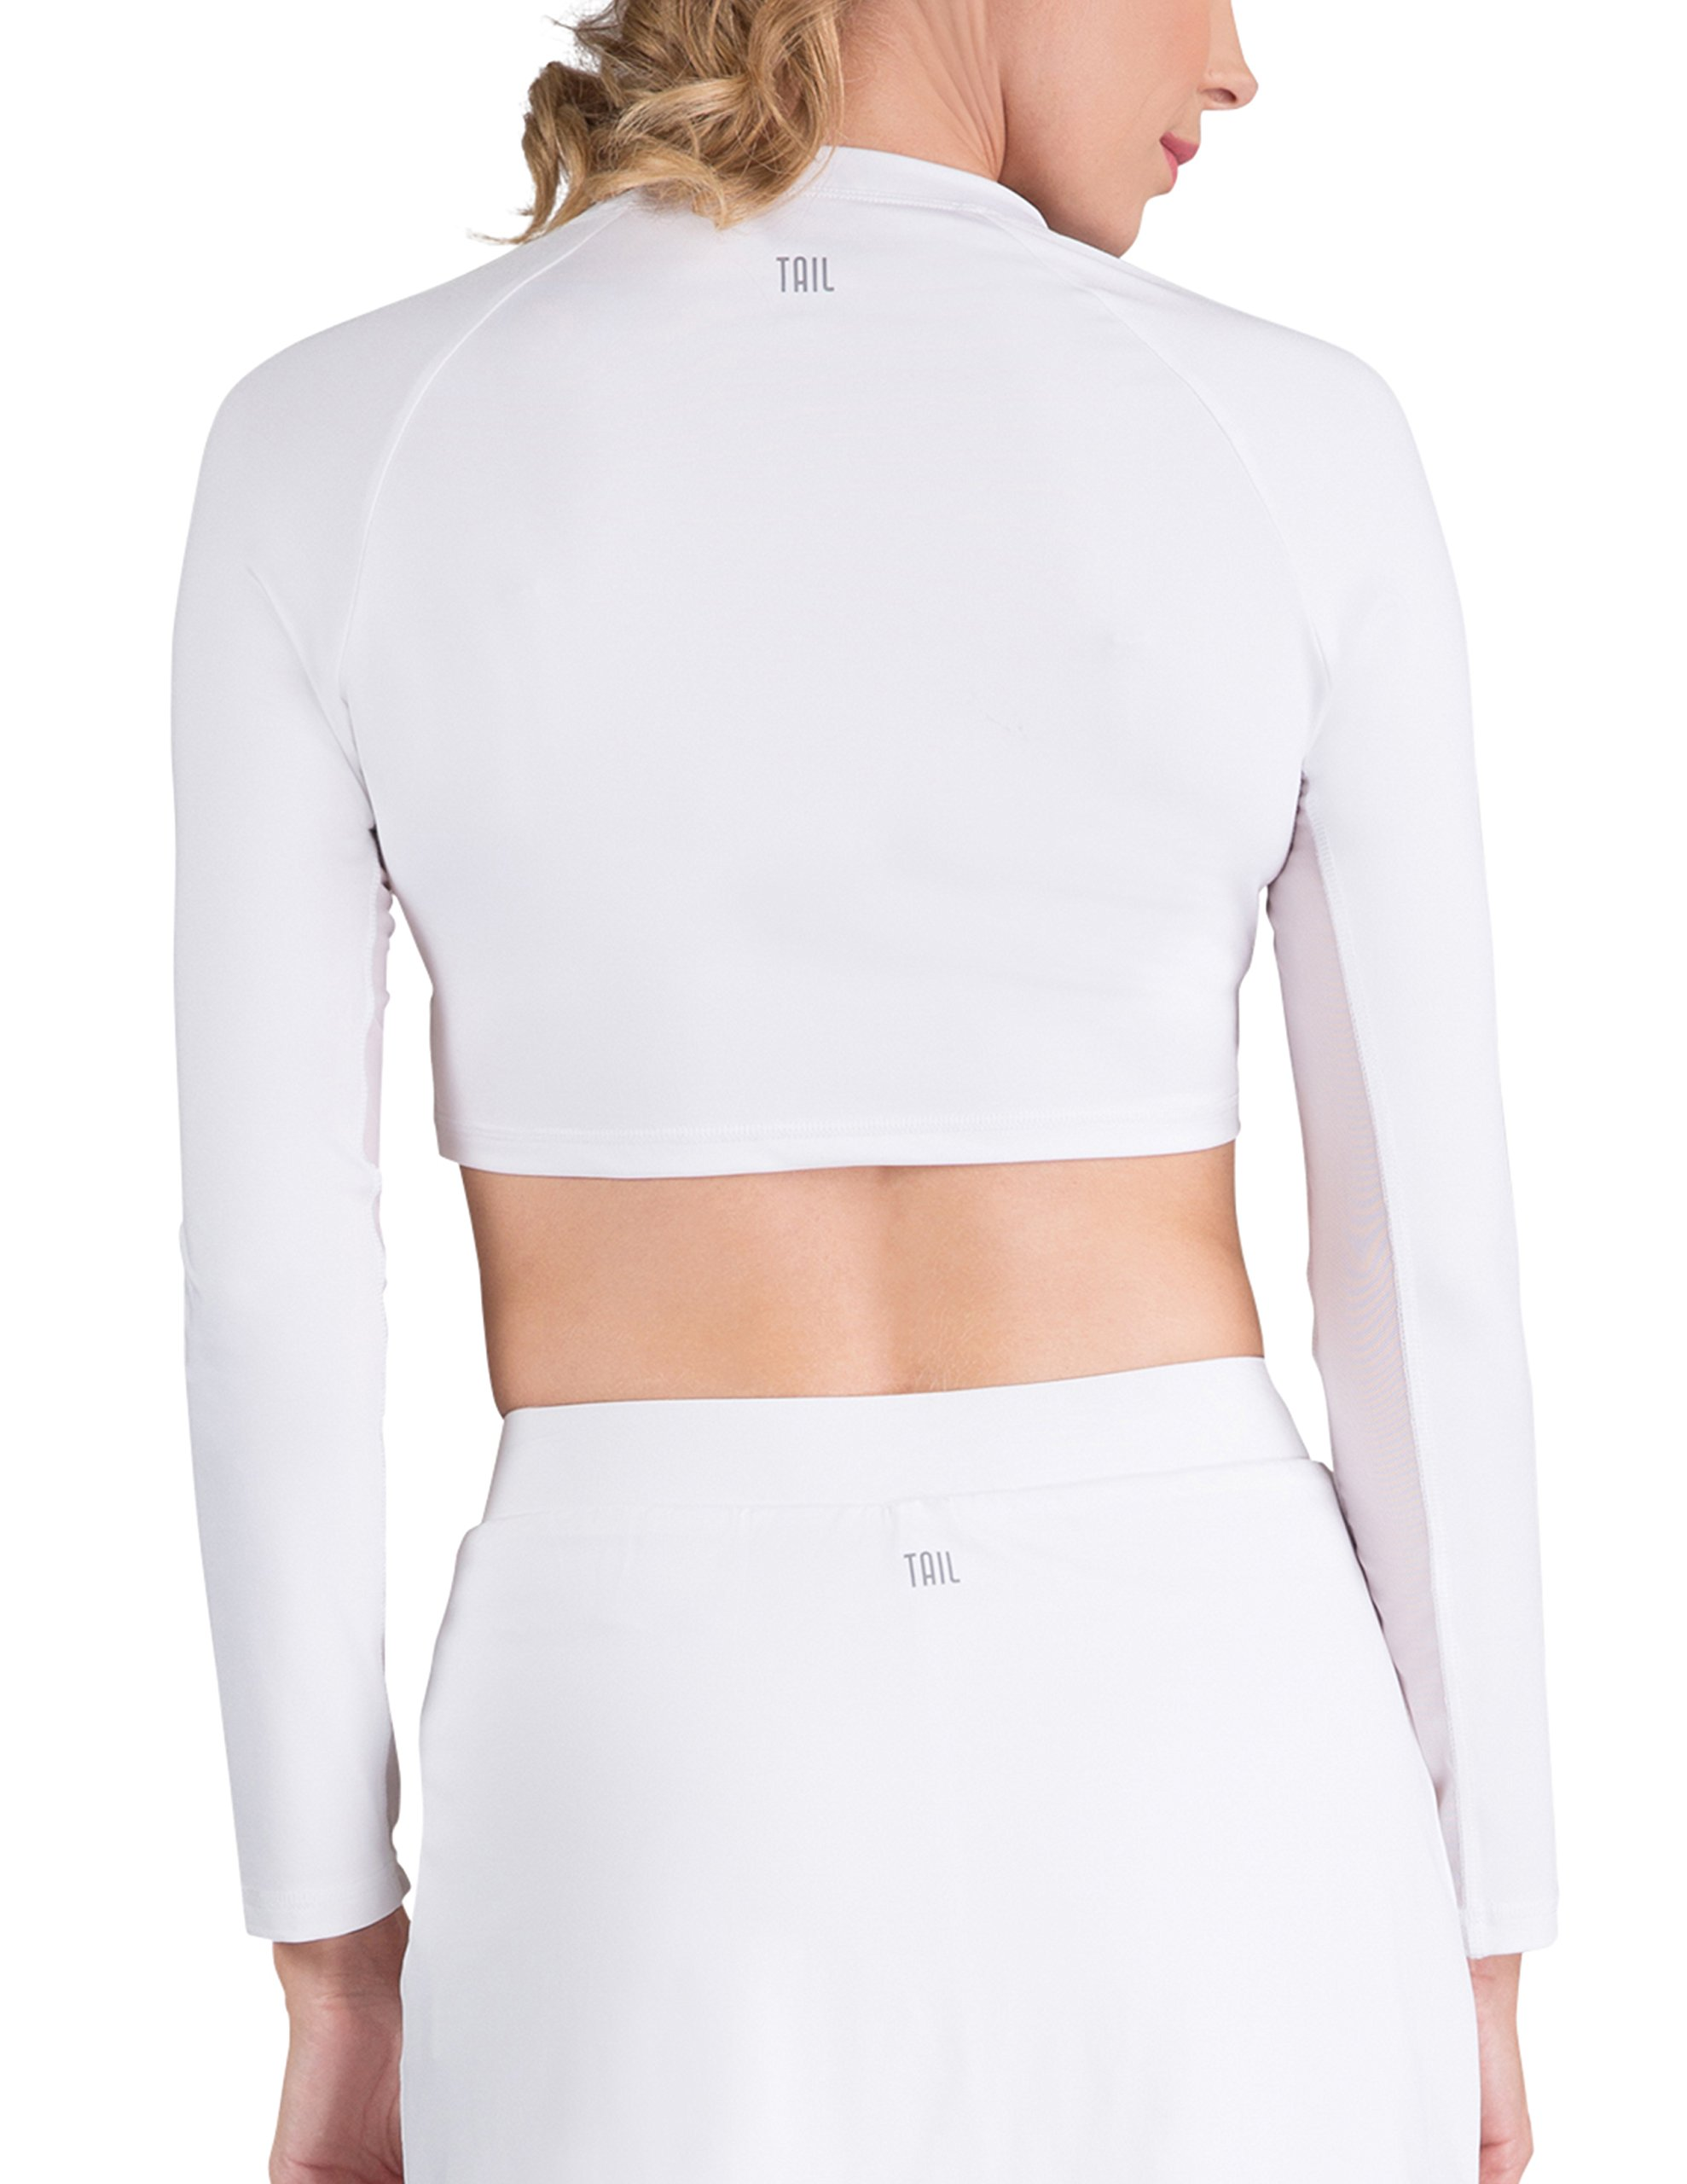 Tail Activewear Women's Sasha Crop Top Large White by Tail (Image #2)